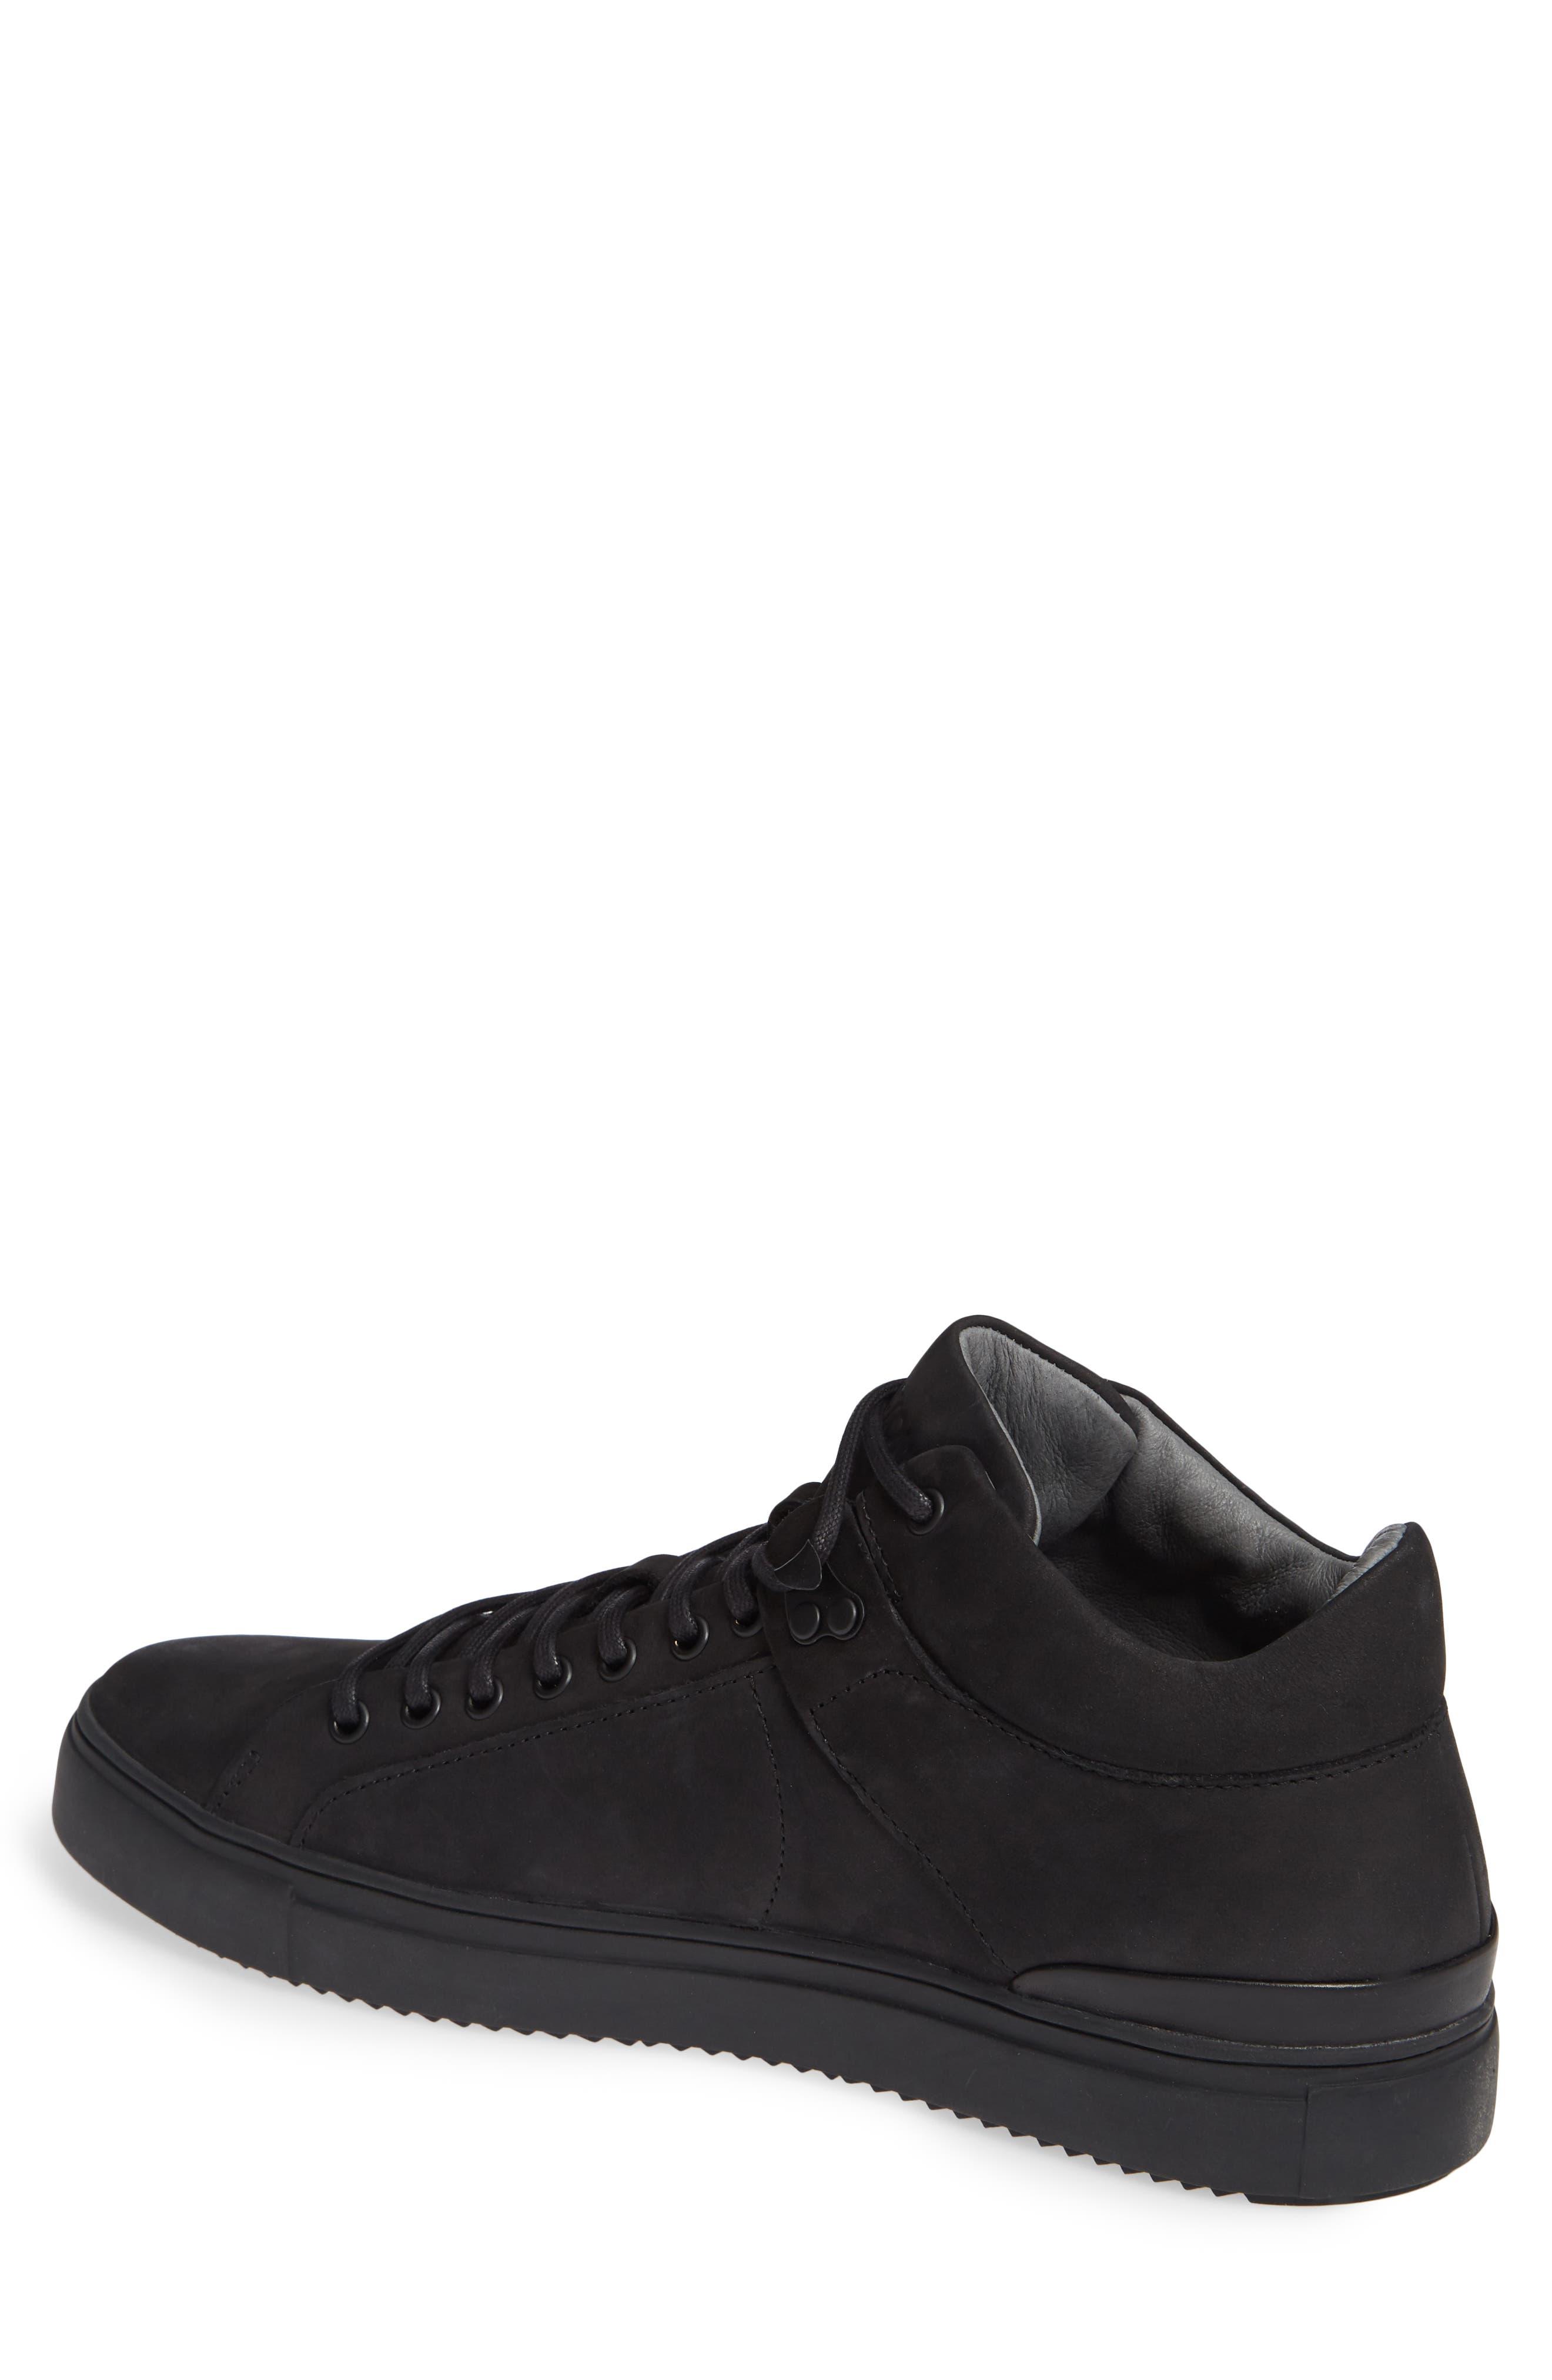 QM87 Sneaker,                             Alternate thumbnail 2, color,                             BLACK